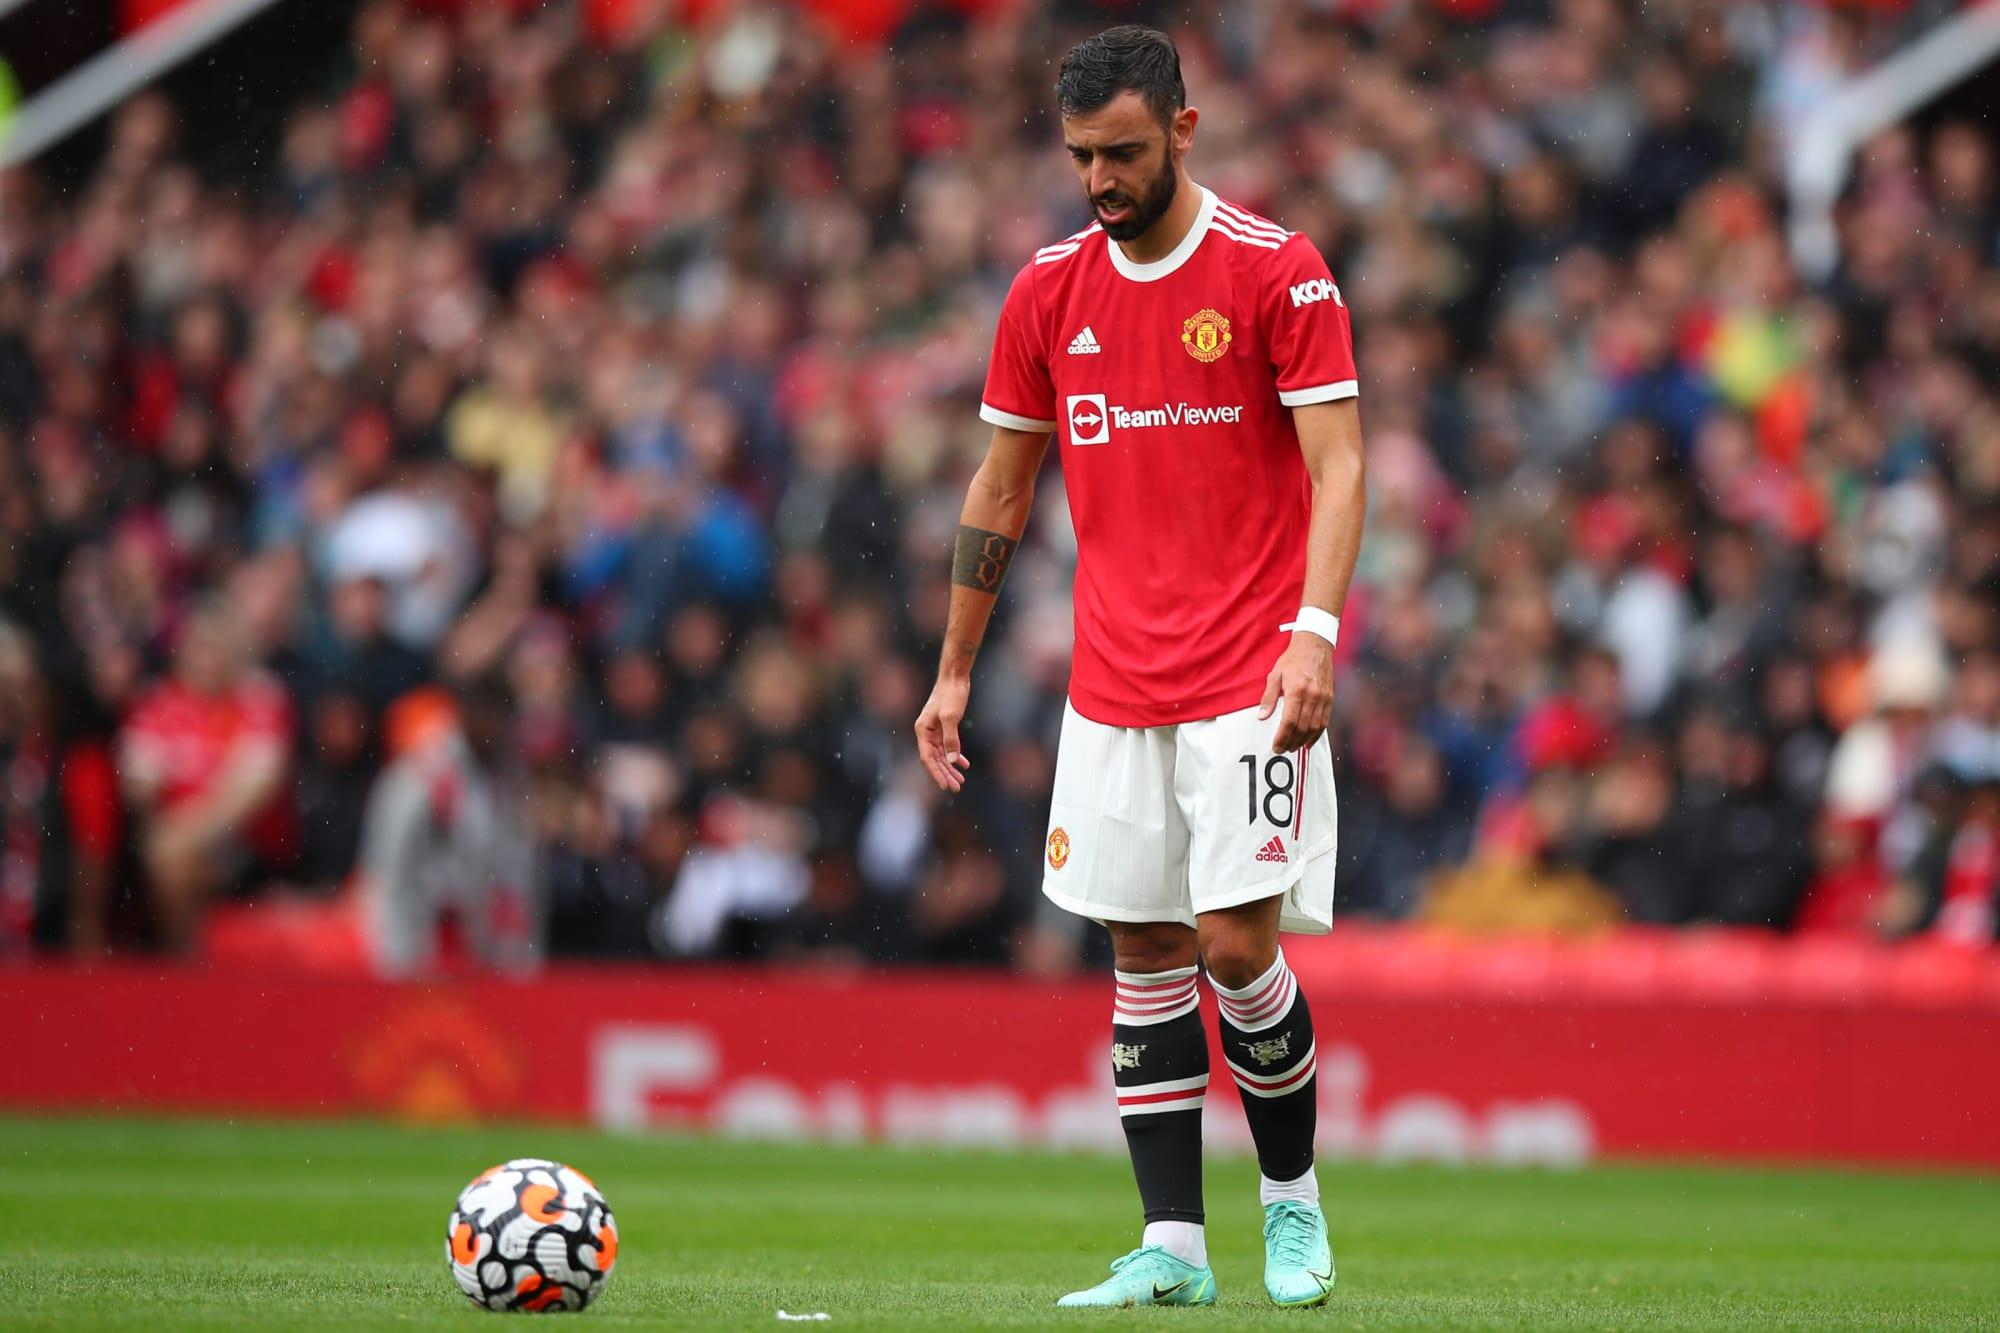 Manchester United v Leeds United live stream, TV channel, prediction: Watch Premier League online